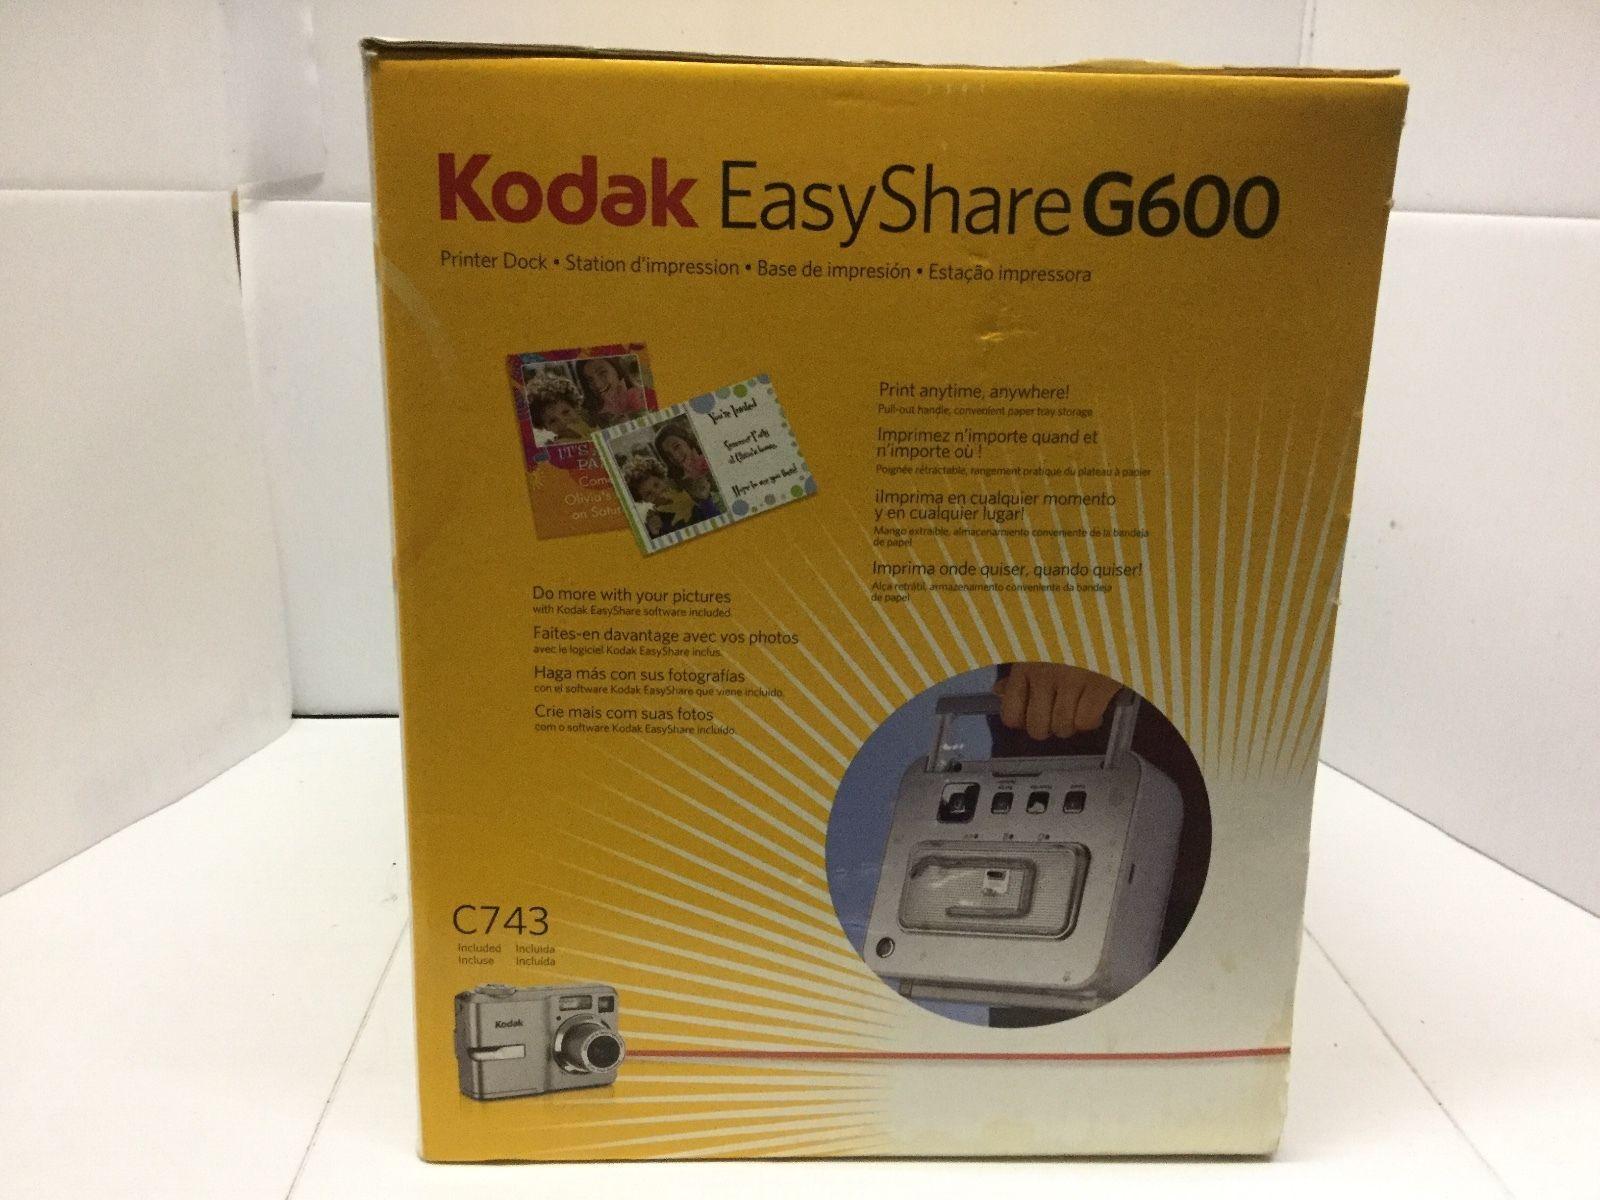 Kodak Easy Share Printer Dock G600 (no and 44 similar items